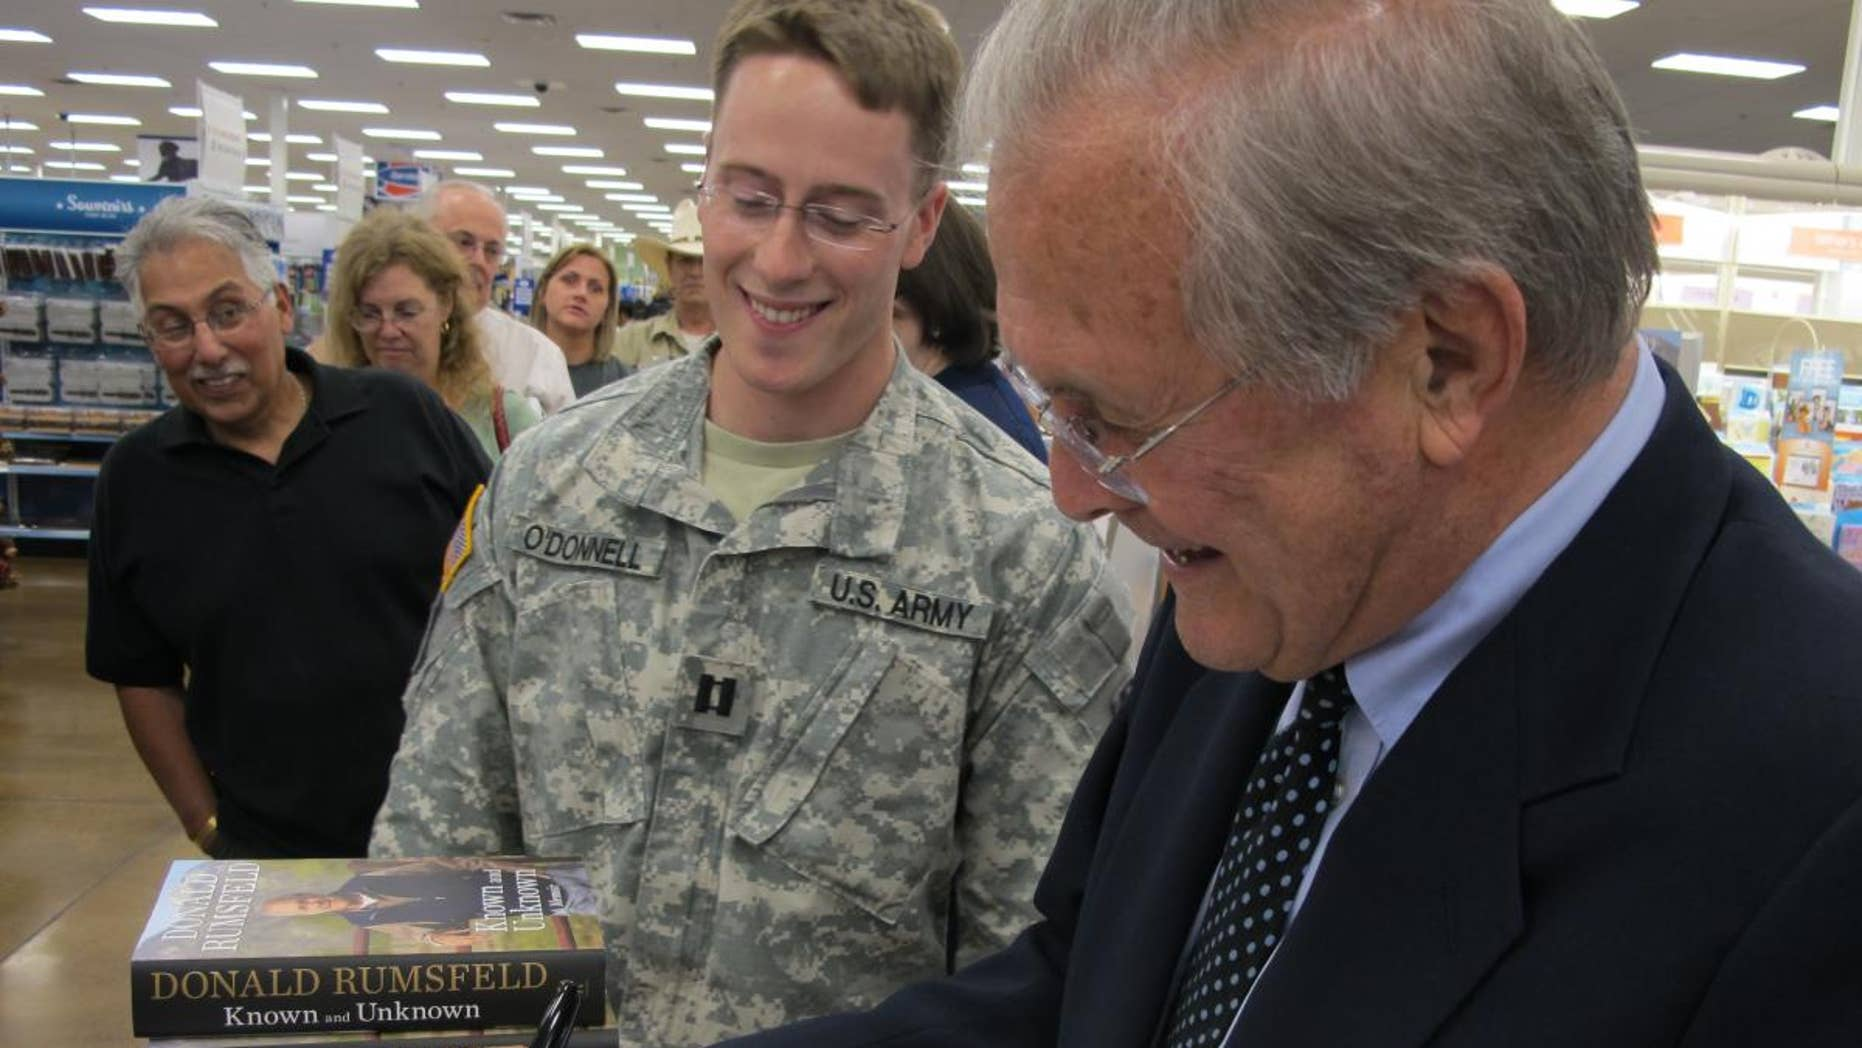 Former Defense Sec. Donald Rumsfeld, May 25, 2011 (Fox News Photo)